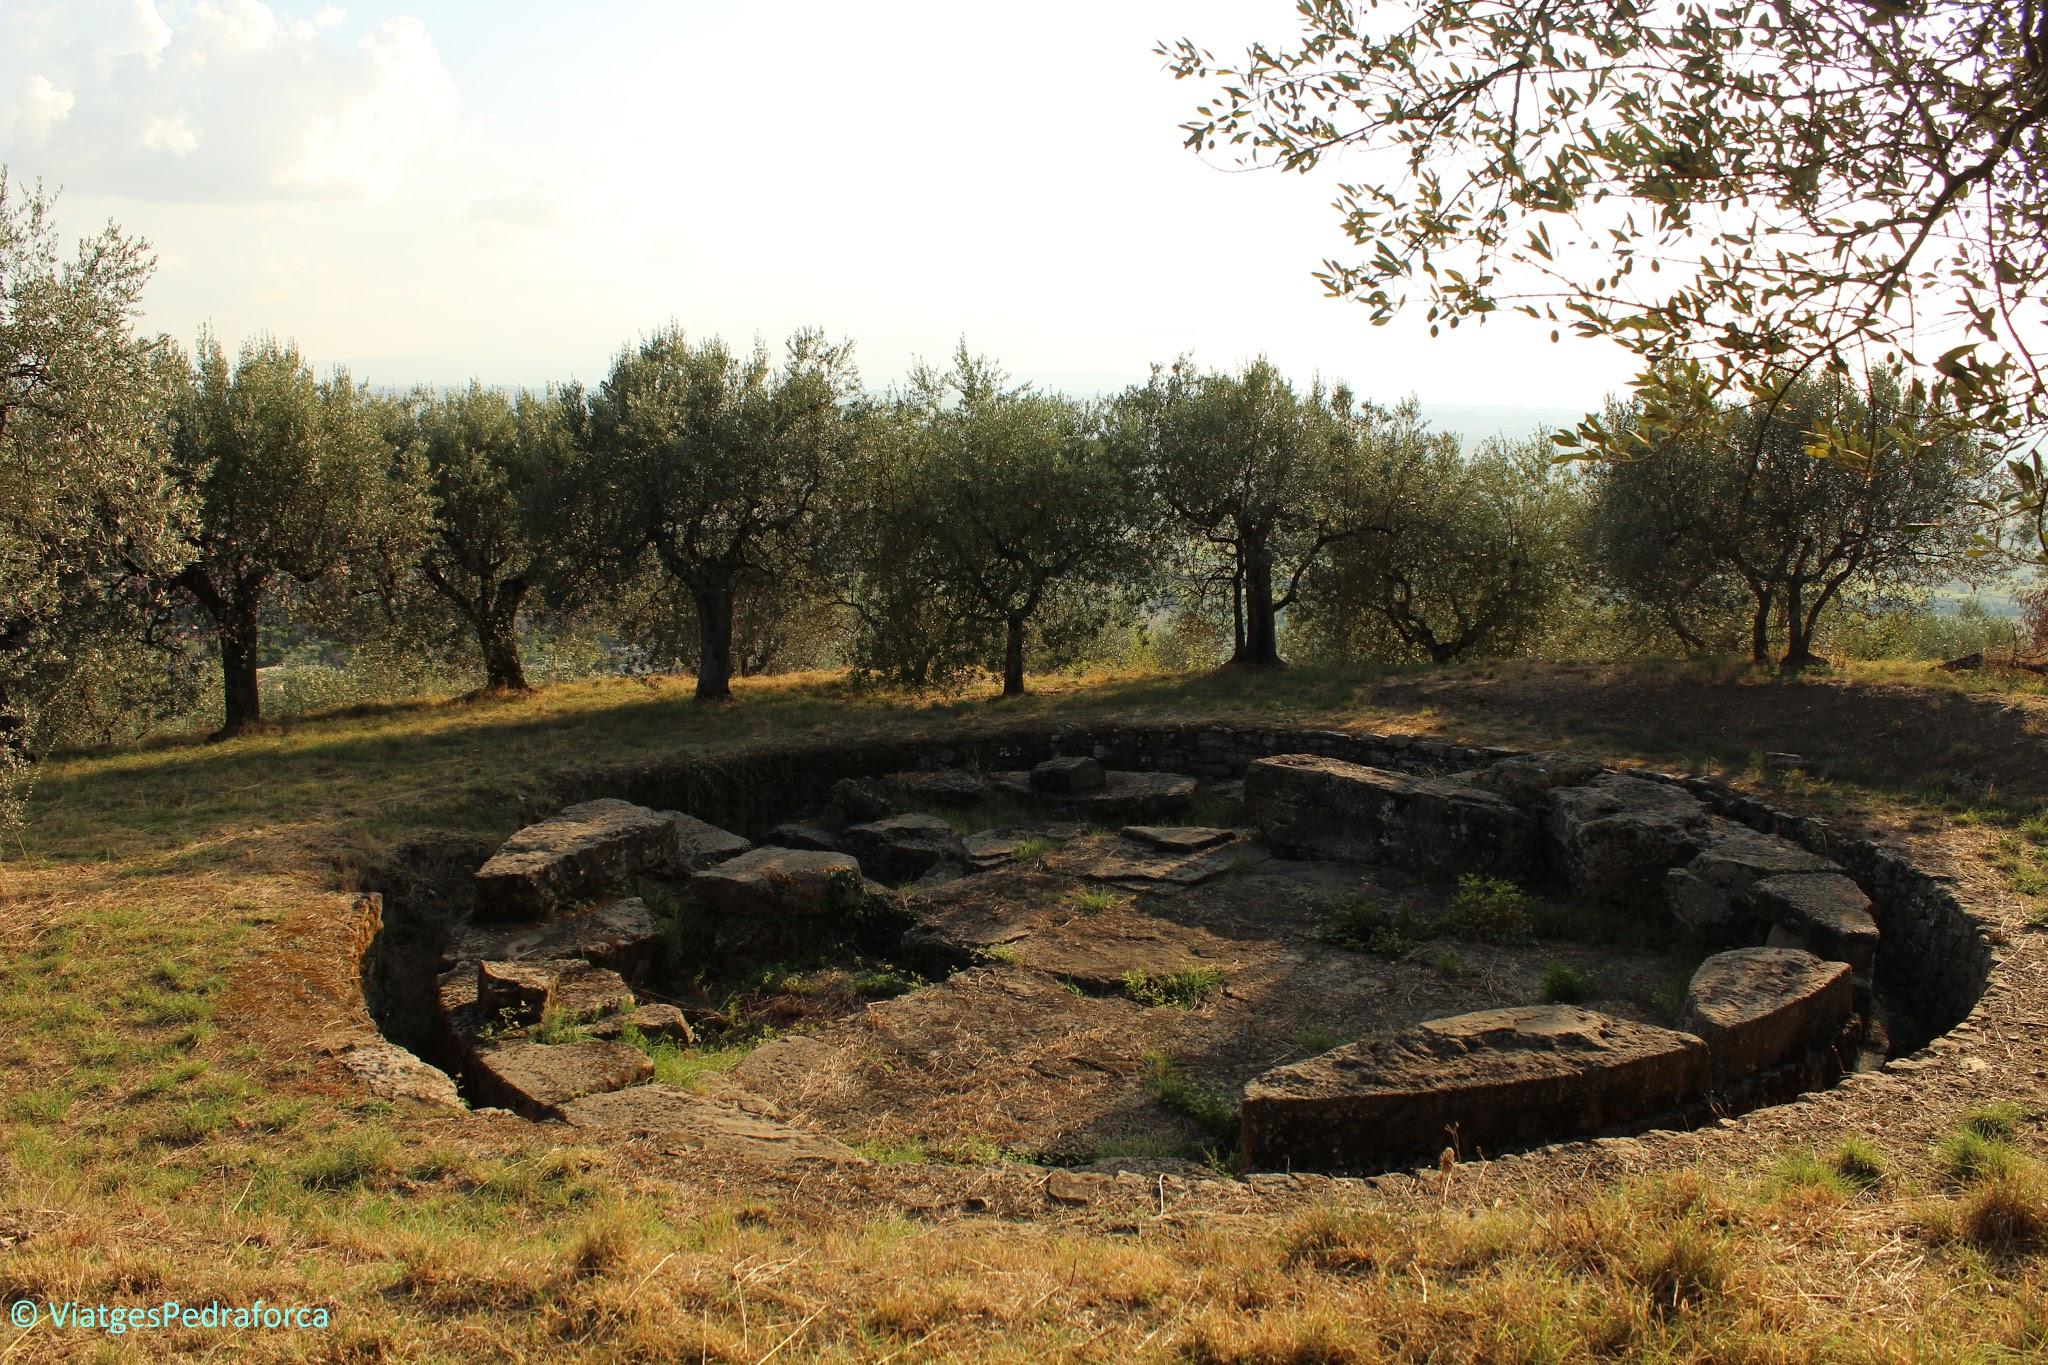 Etruscs, arqueologia, Toscana, Itàlia